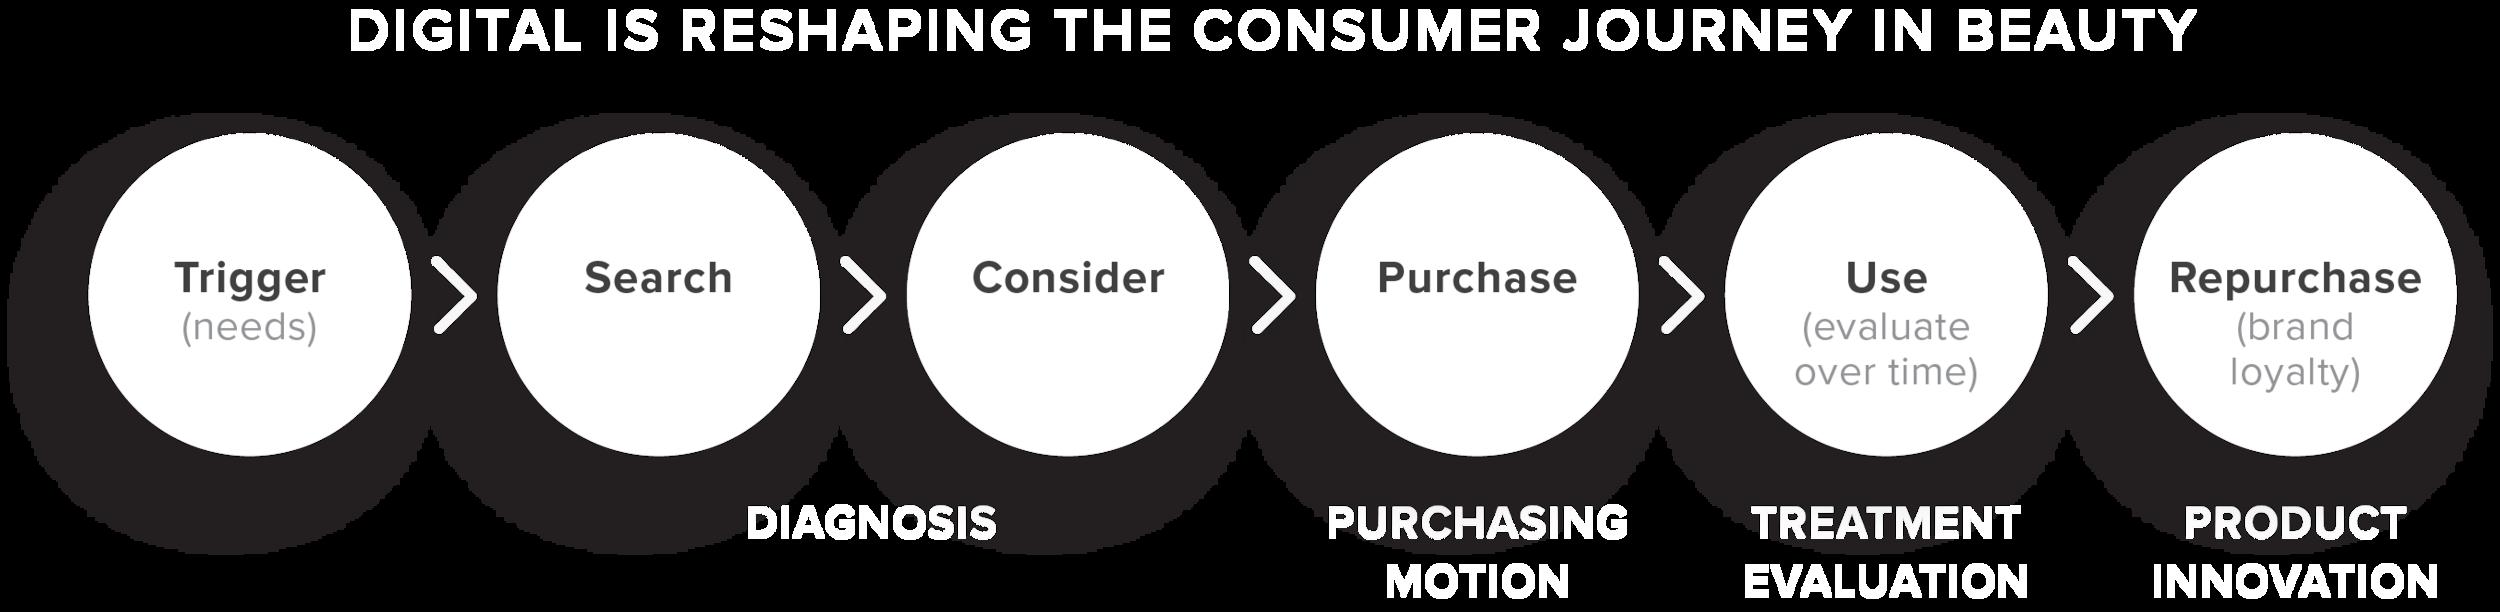 digital-reshaping-consumer-journey-white@2x.png